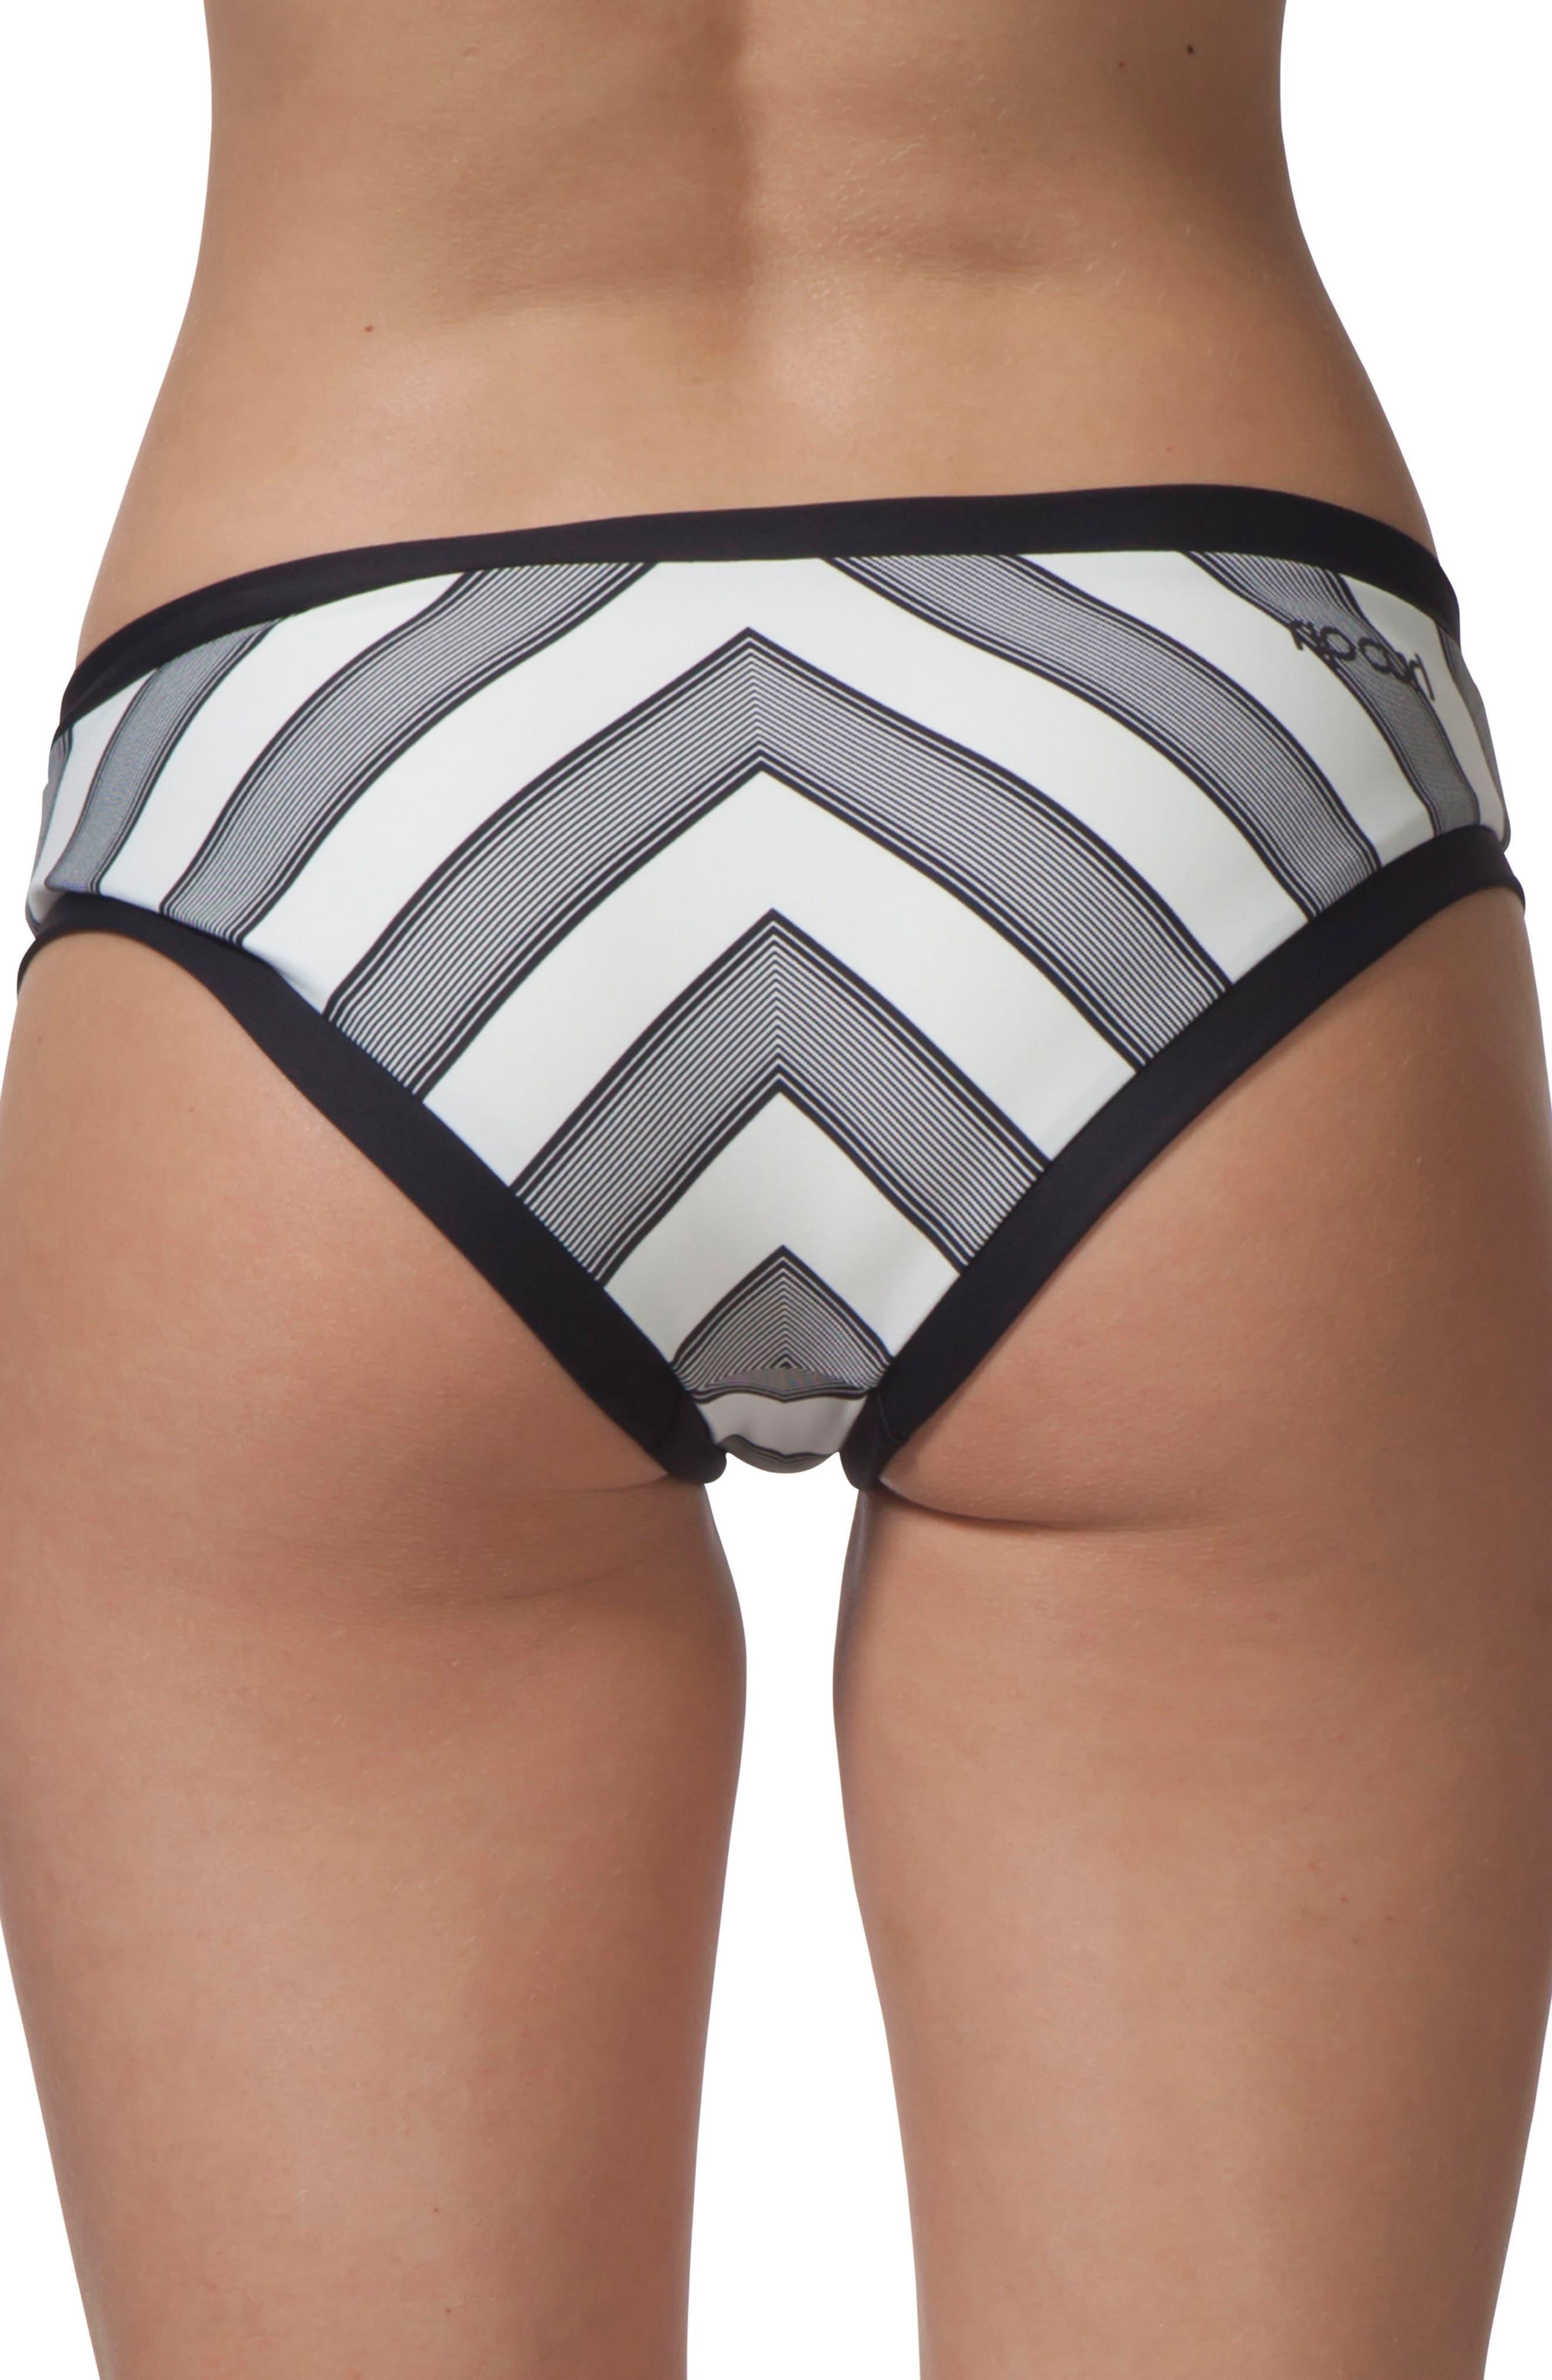 Mirage Line Up Hipster Bikini Bottoms,                             Alternate thumbnail 2, color,                             Black